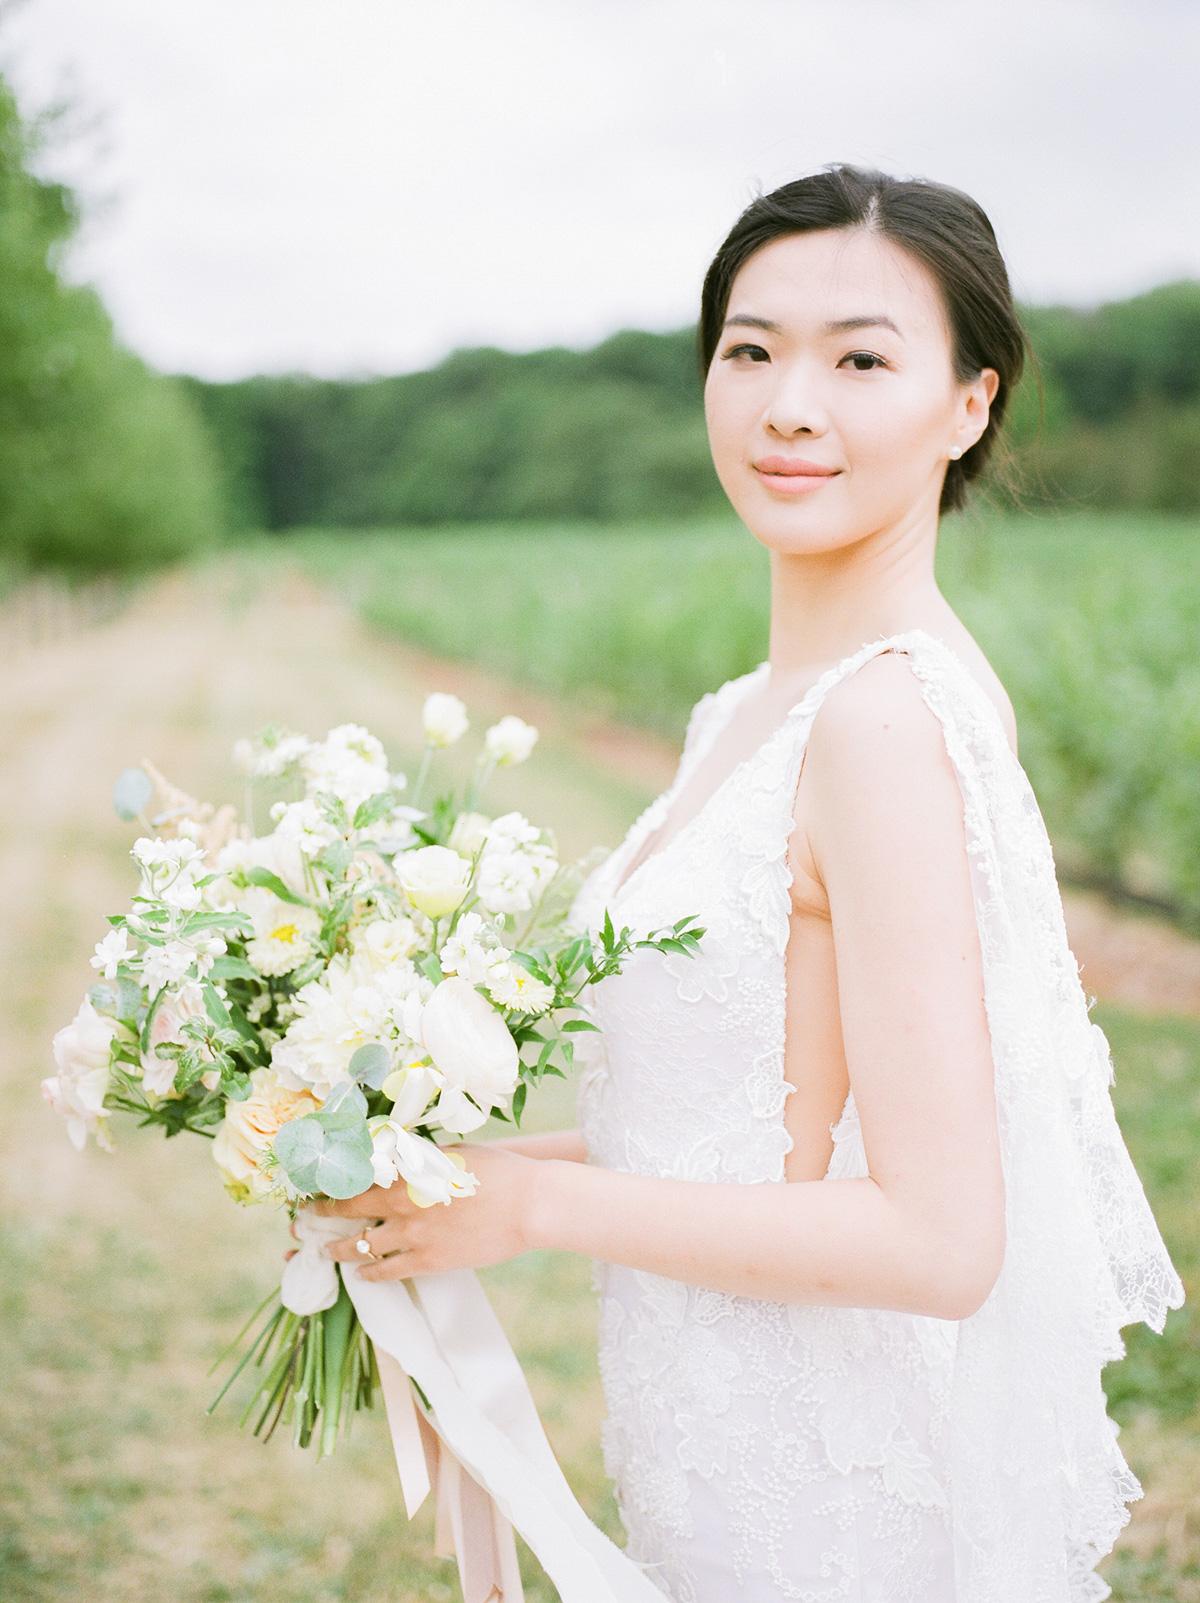 jennifer-xu-photography-vineyard-bride-swish-list-rosewod-eatstes-winery-beamsville-wedding-editorial-3.jpg